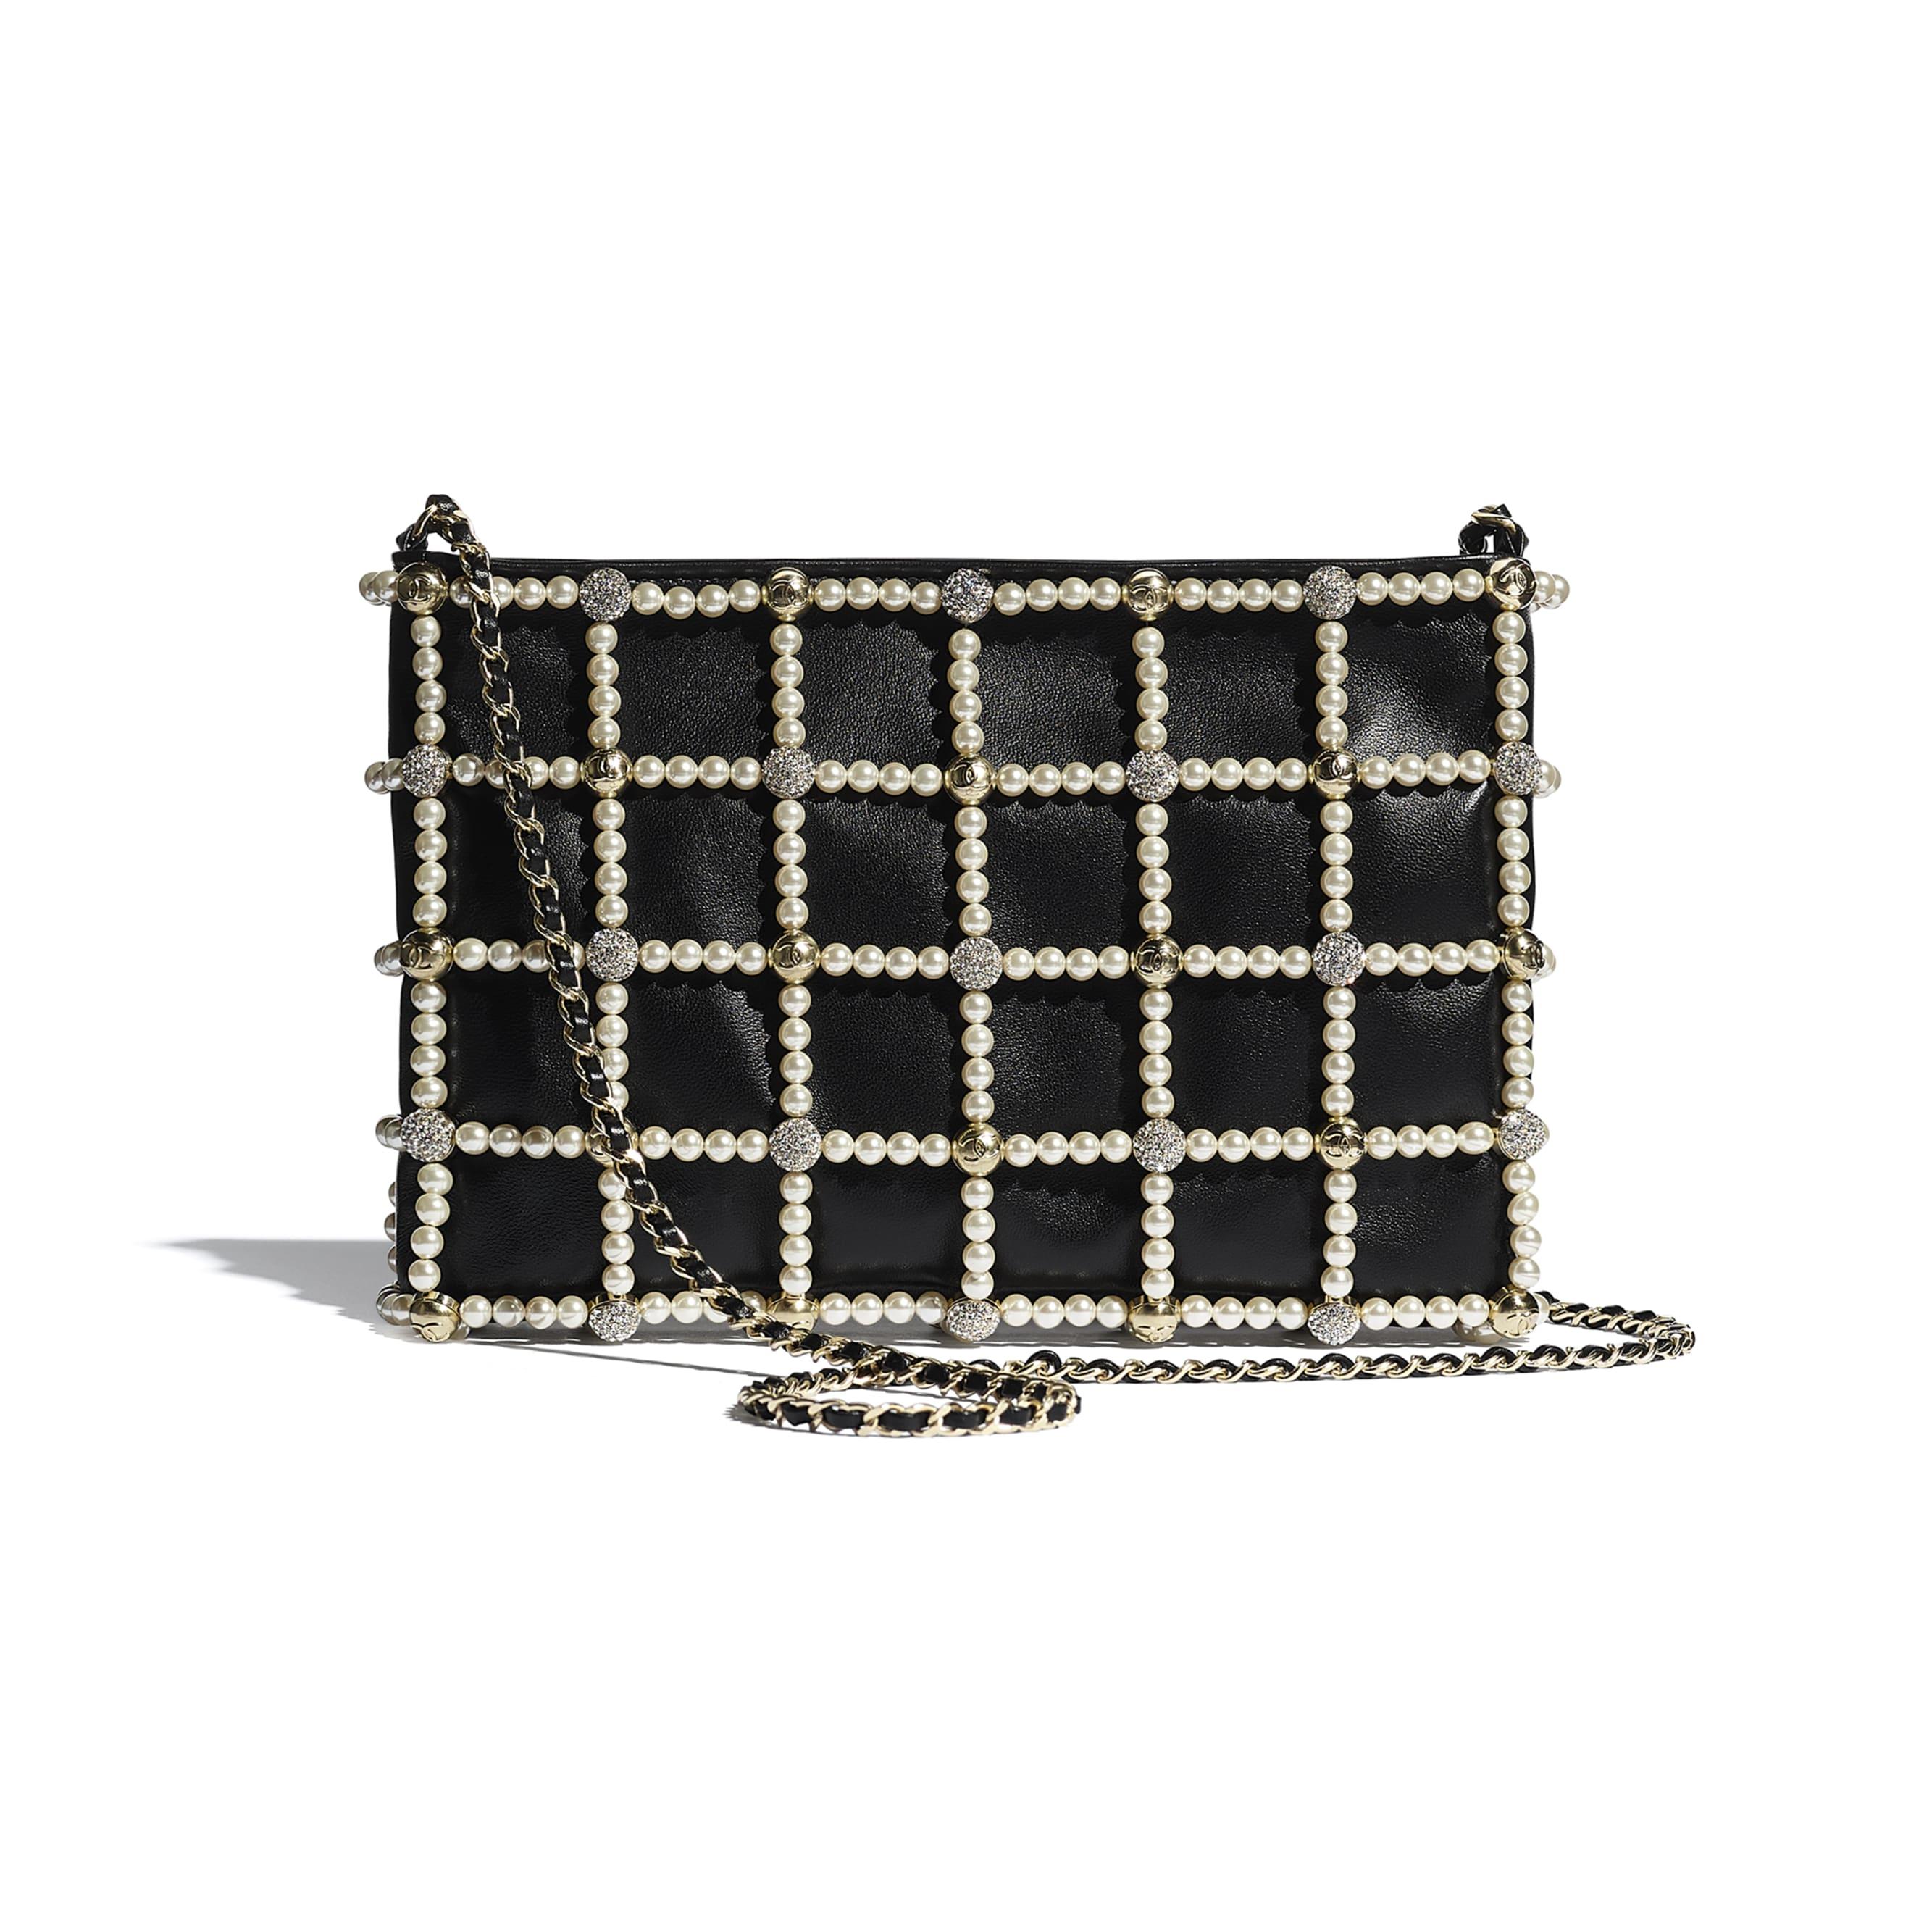 Clutch - Black - Lambskin, Calfskin, Glass Pearls, Strass & Gold-Tone Metal - CHANEL - Vista predefinida - ver a versão em tamanho standard